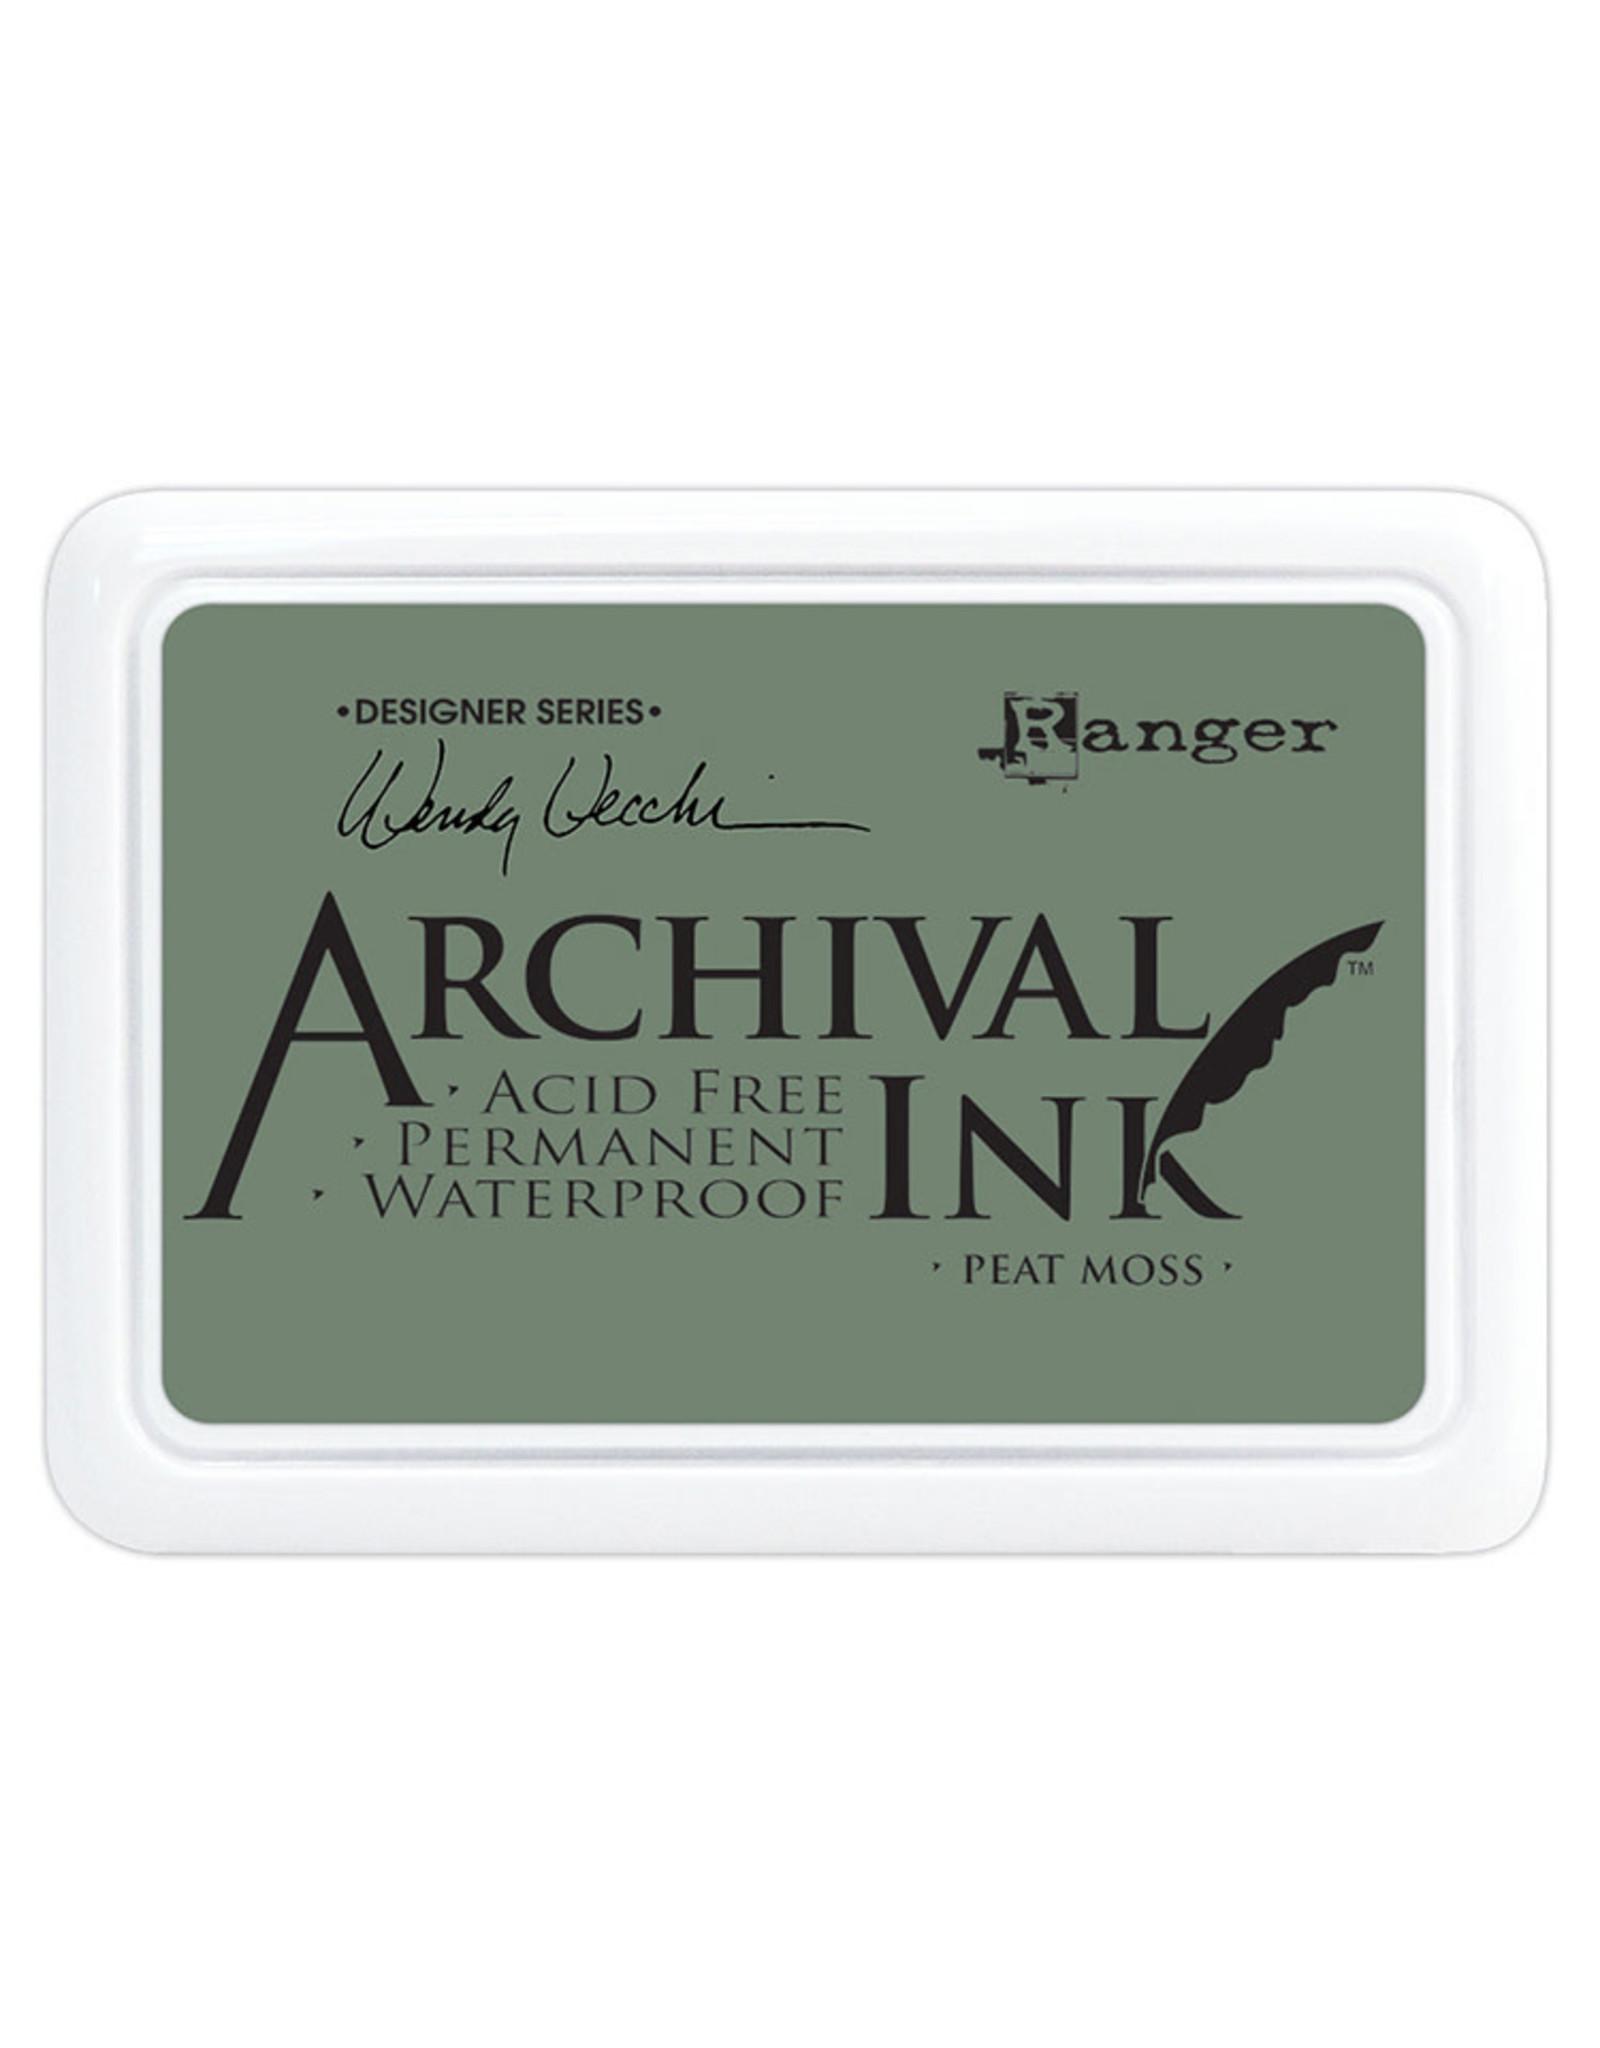 Ranger Archival Ink - Peat Moss